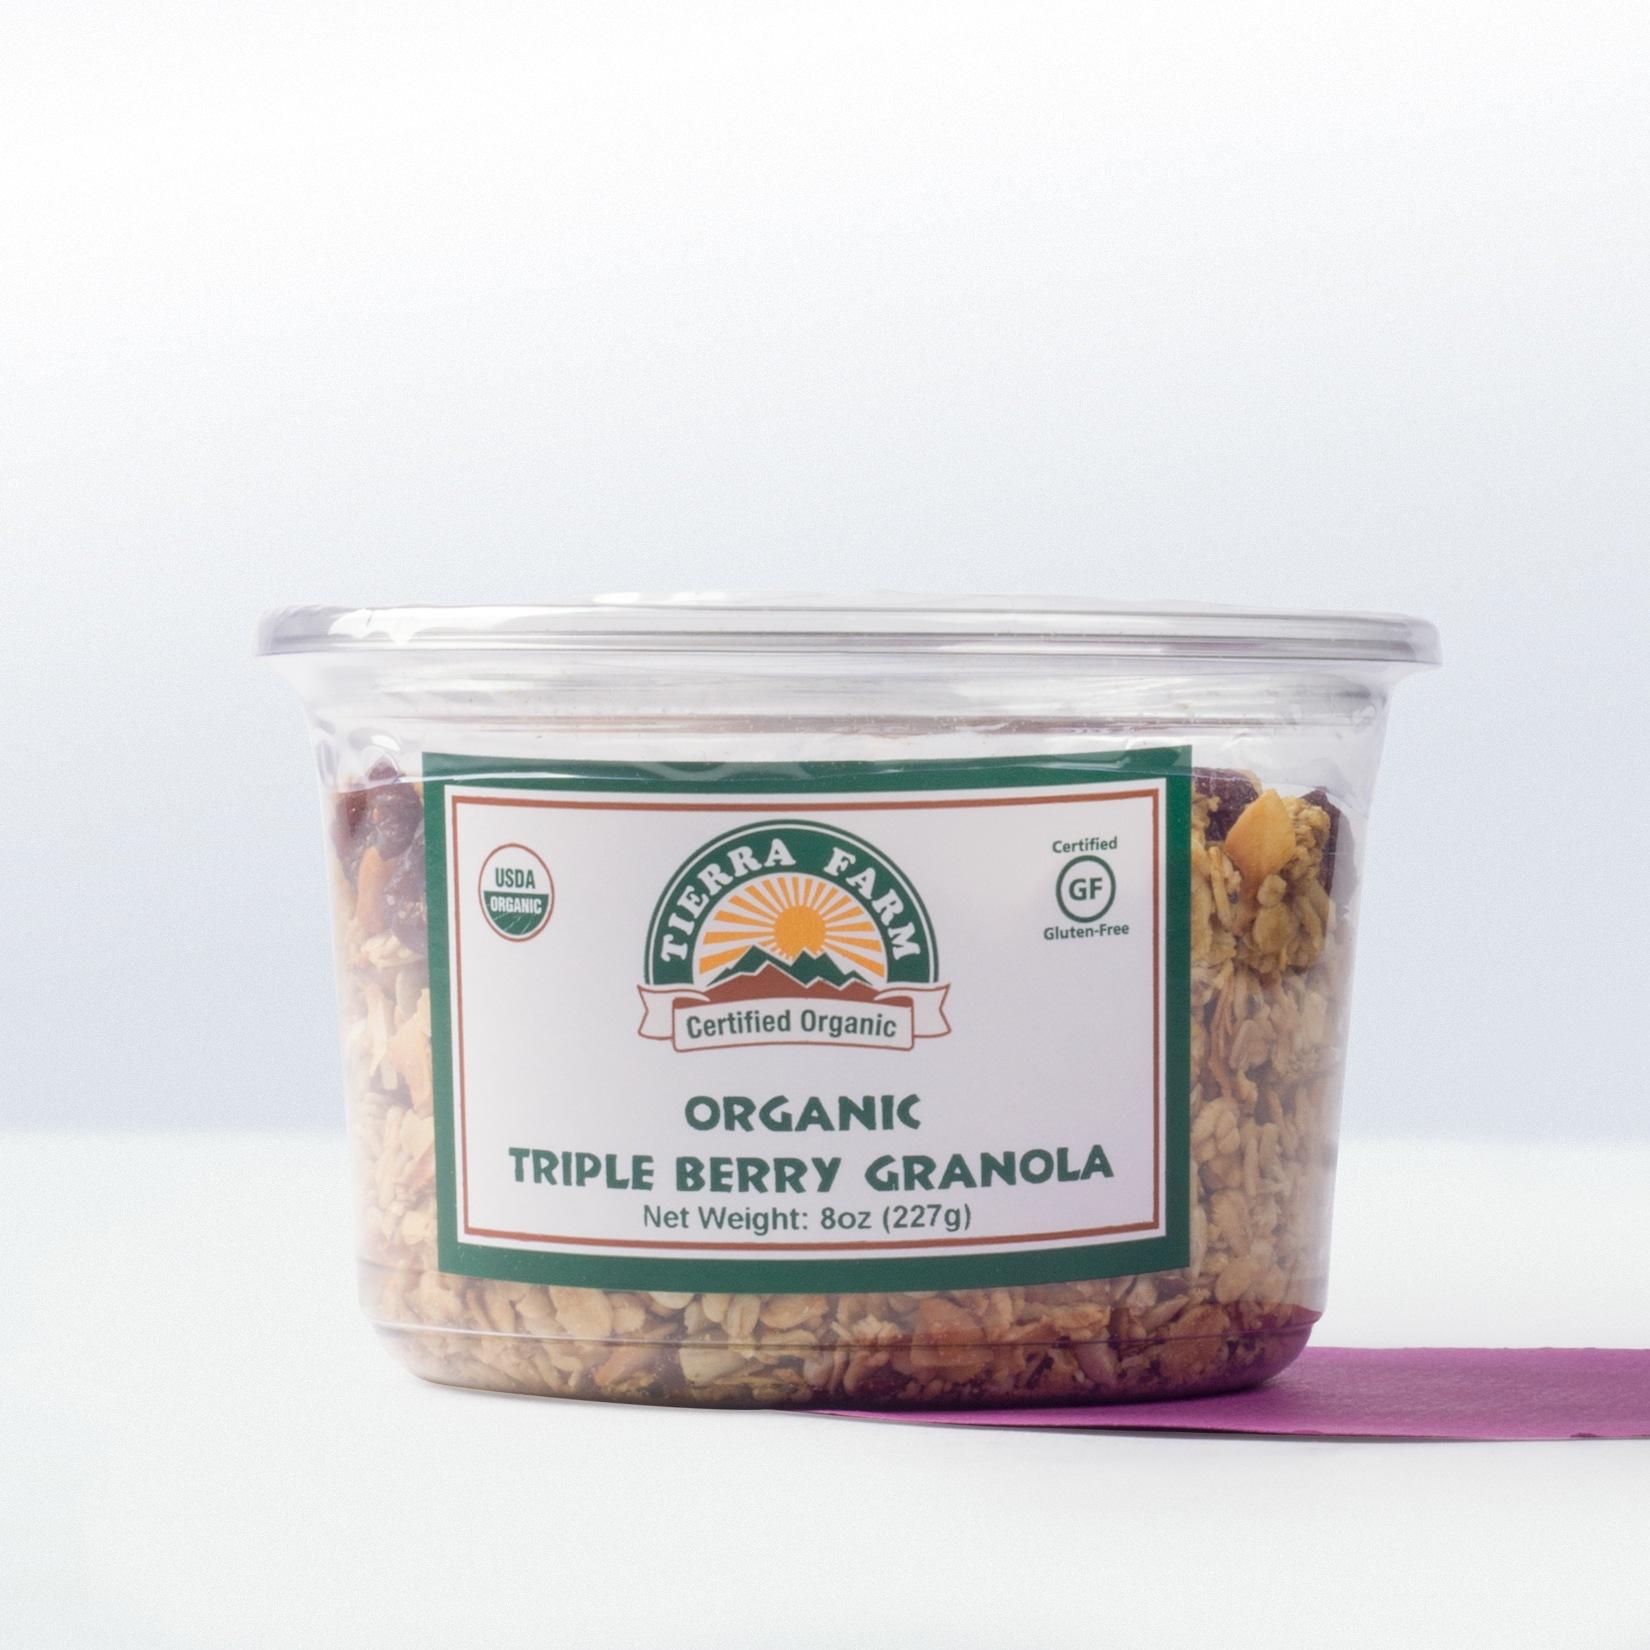 Tierra Farm-Organic Triple Berry Granola